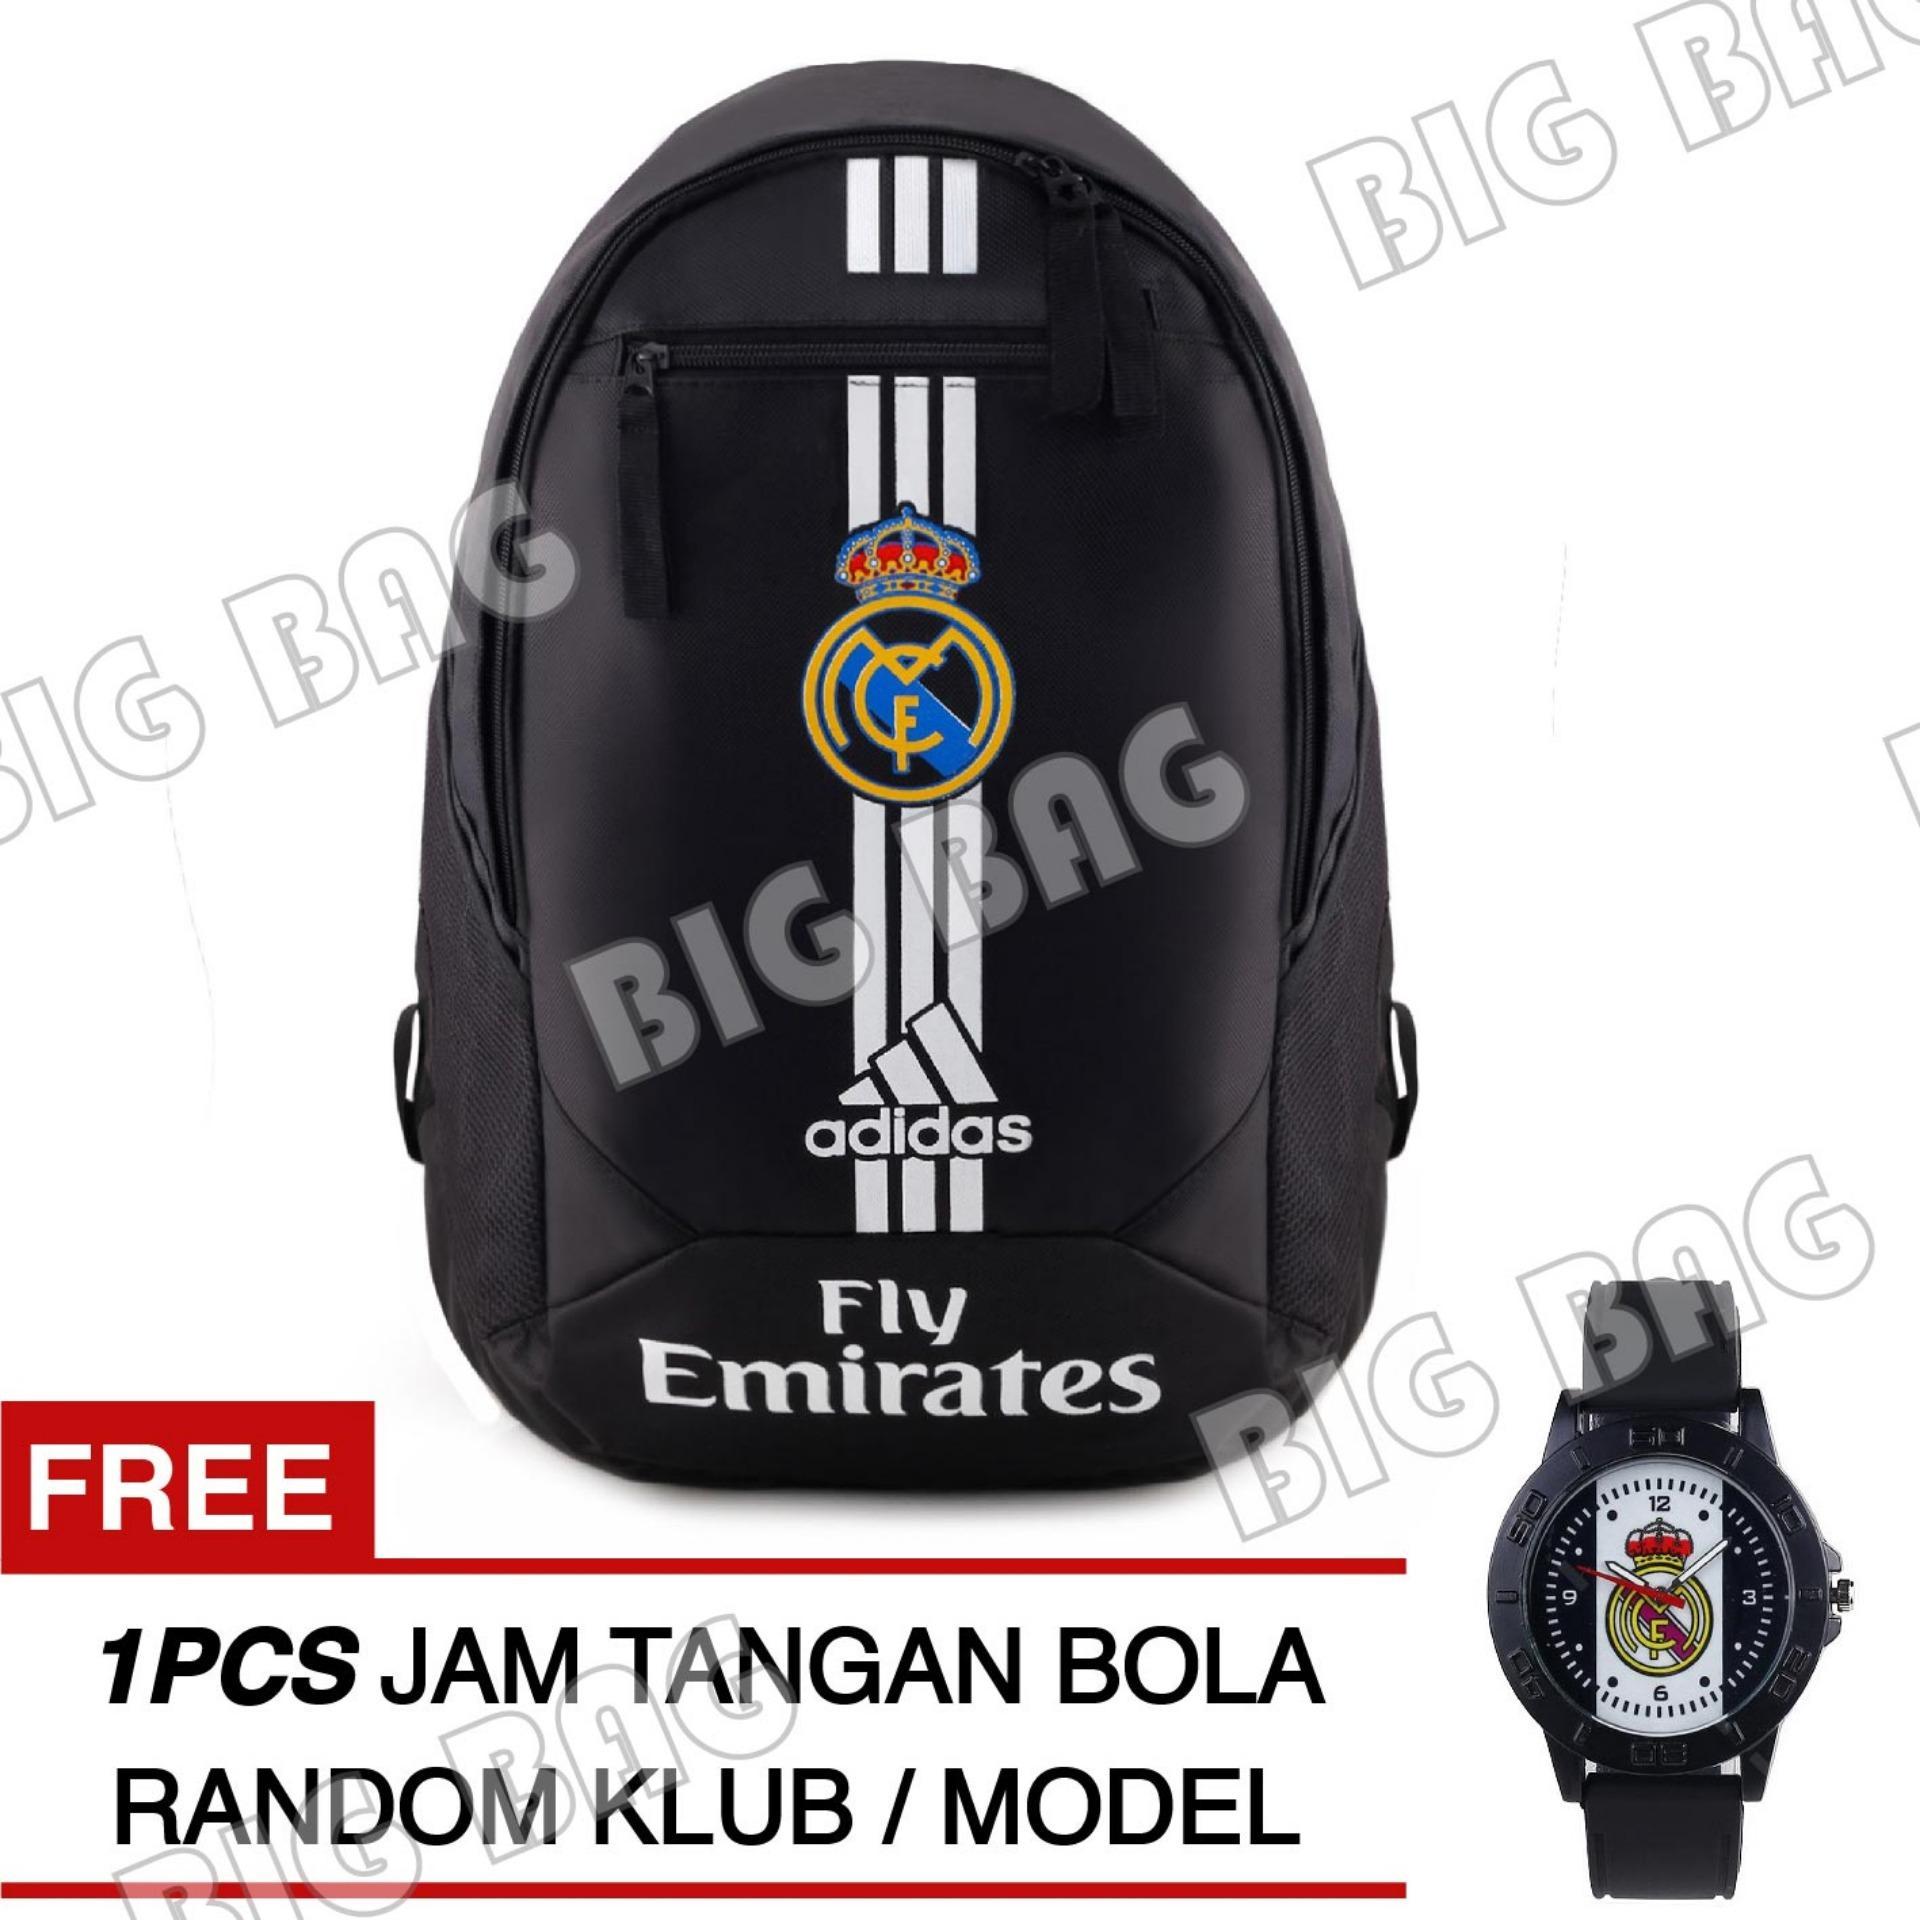 Tas Ransel Adidas Bola Pria Real Madrid C.F Laptop Backpack Men Soccer Editions - Black + Raincover + FREE Jam Tangan  Pria Random Color / Model